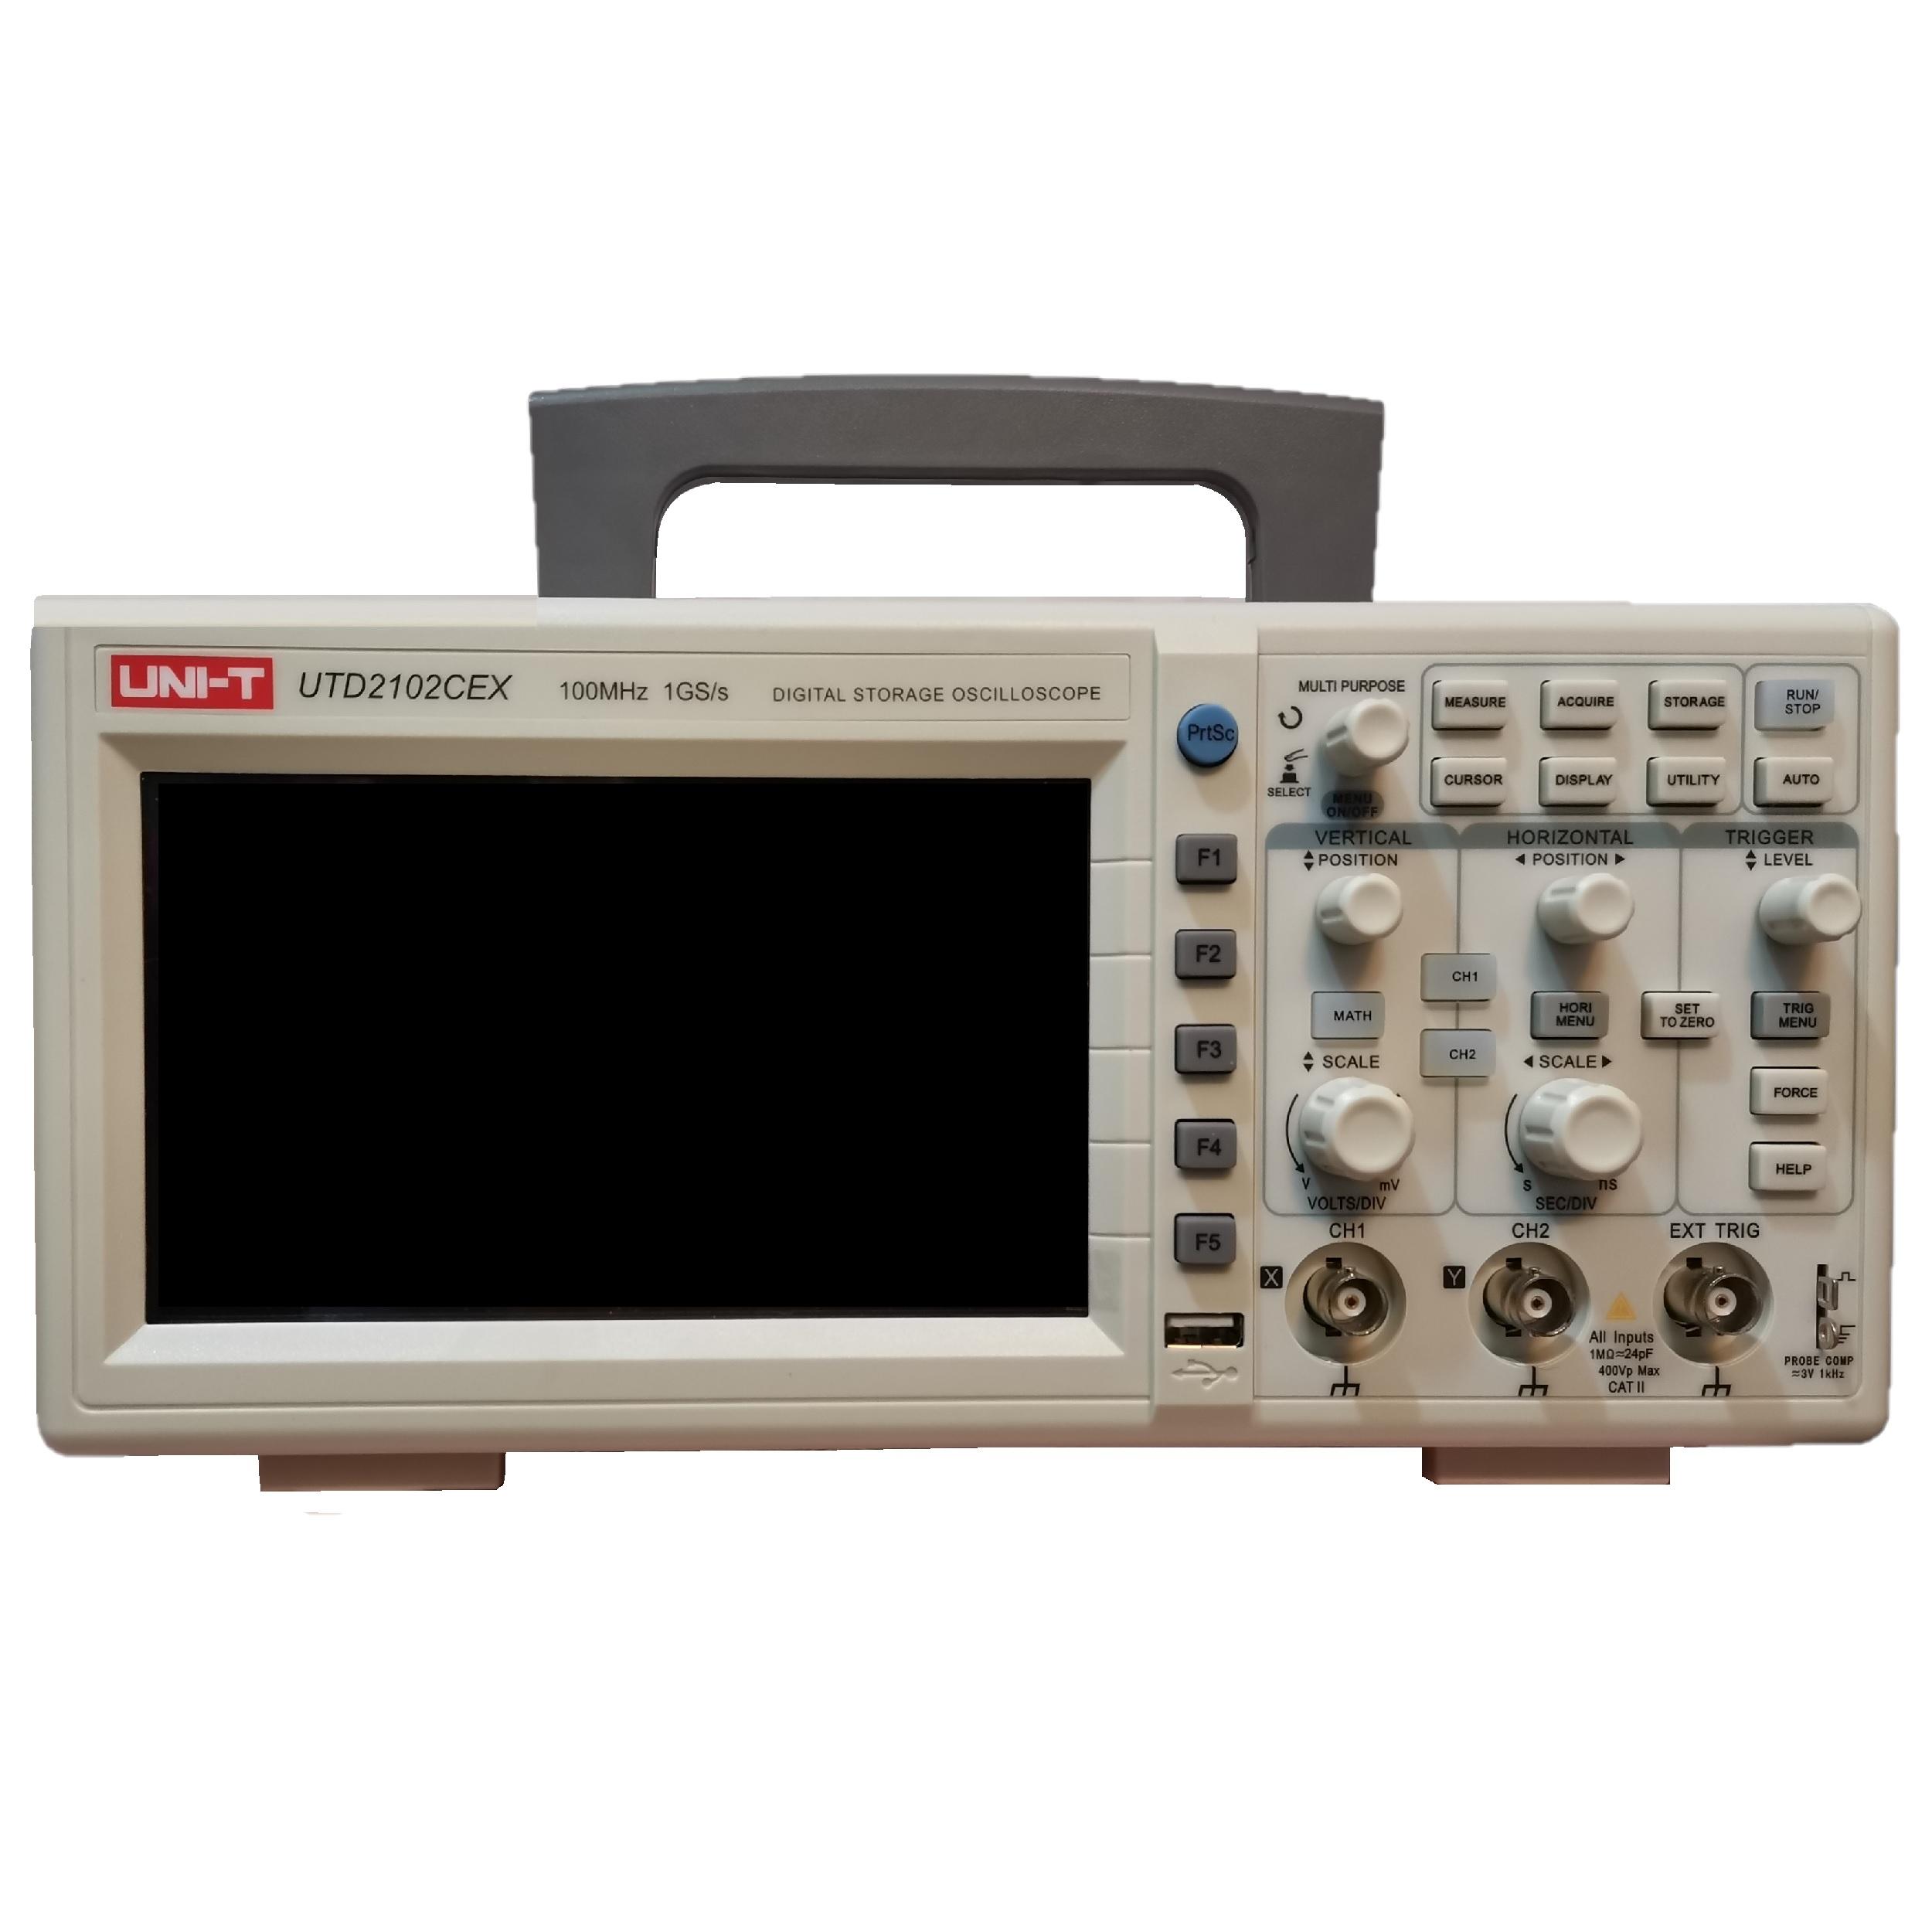 اسیلوسکوپ یونی-تی مدل UTD2102CEX